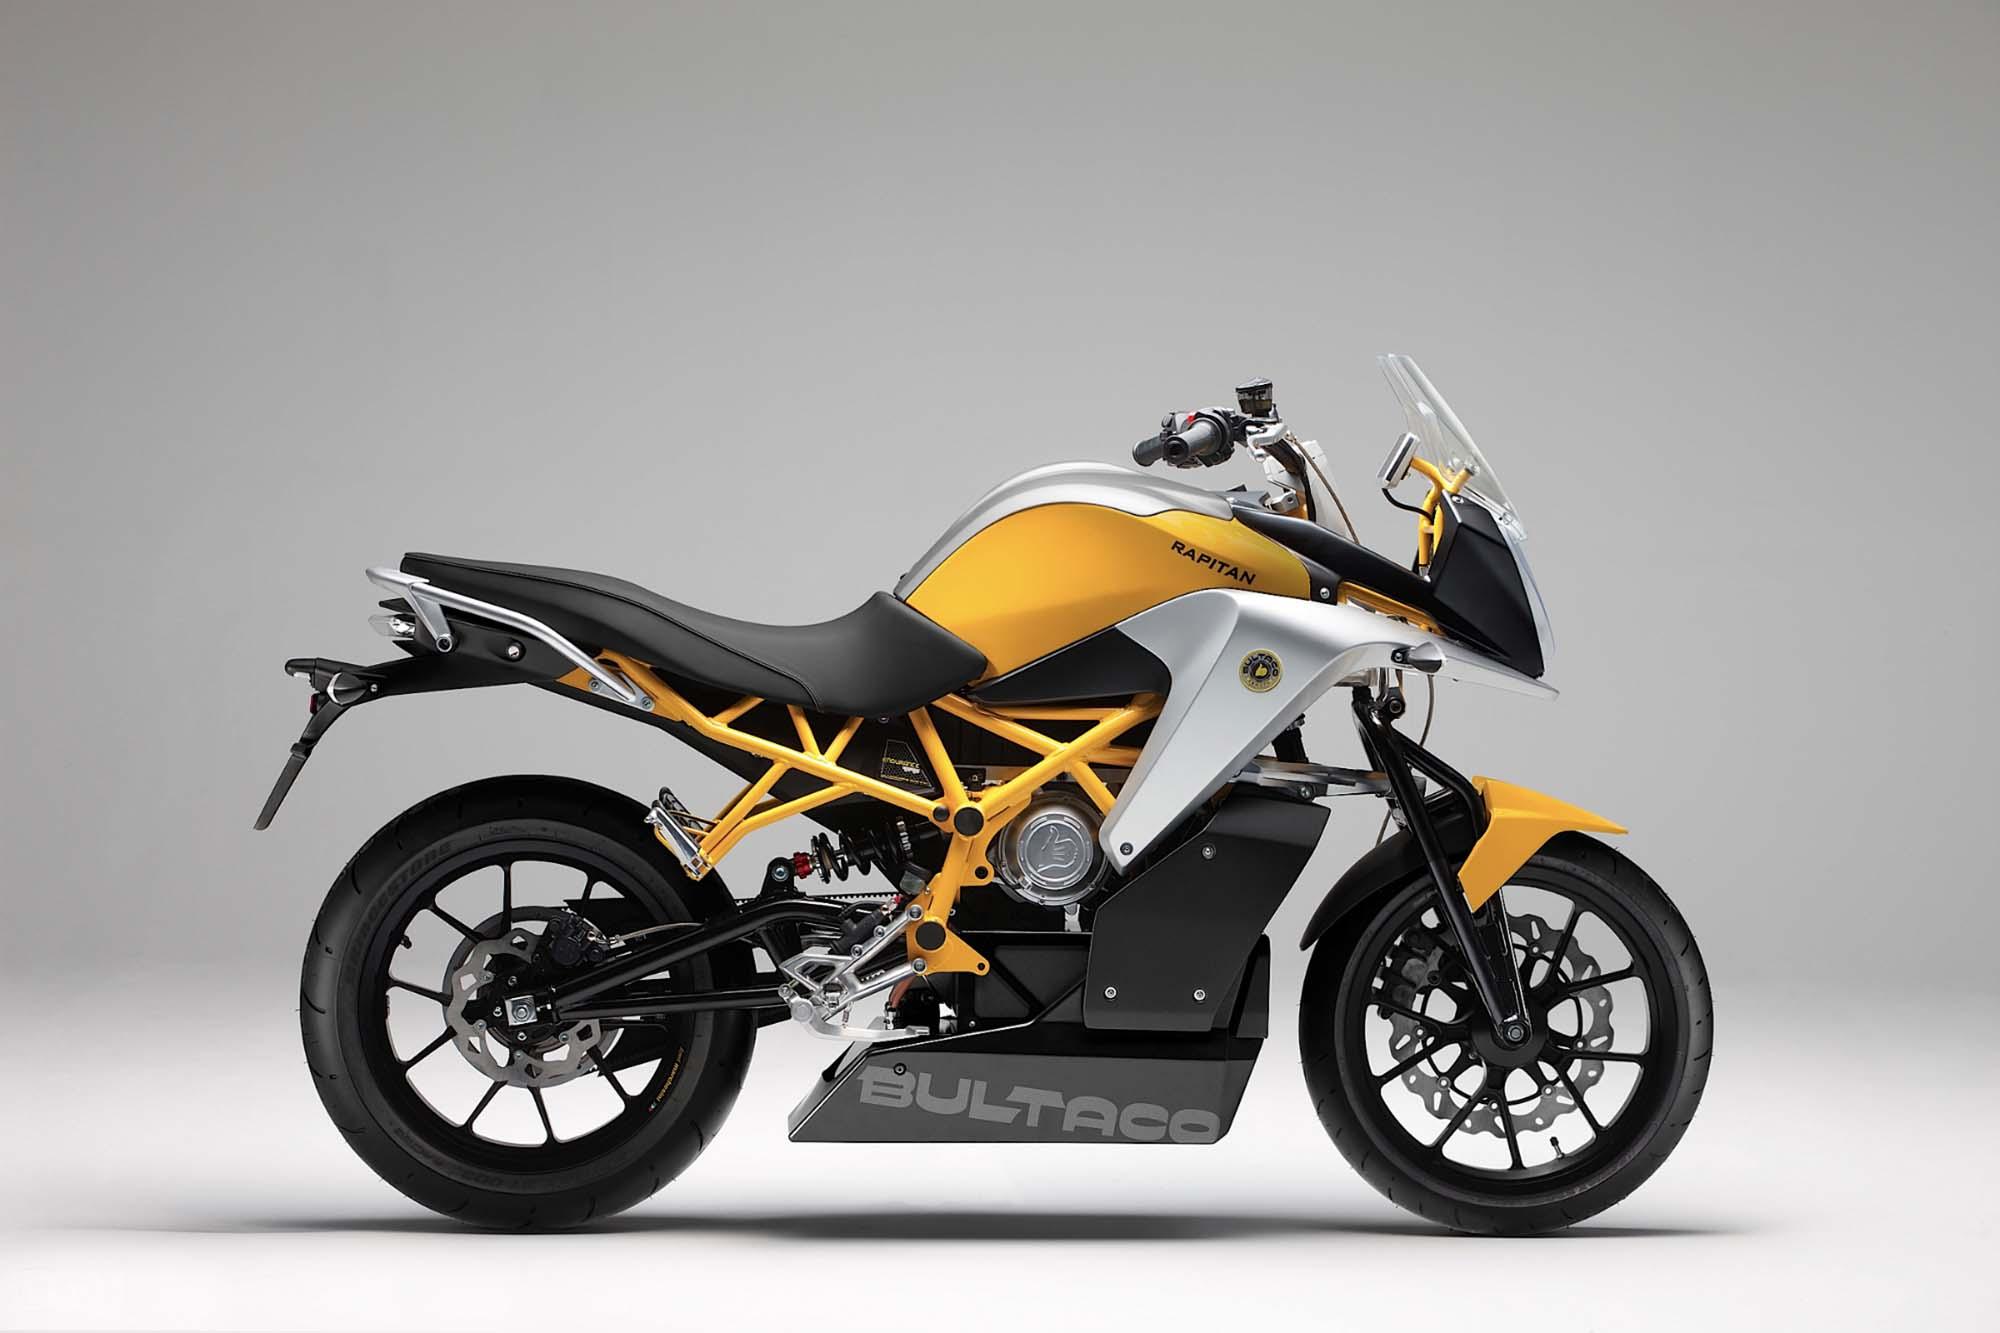 La sportive verte du futur - Page 15 Bultaco-Rapitan-Electric-street-bike-02